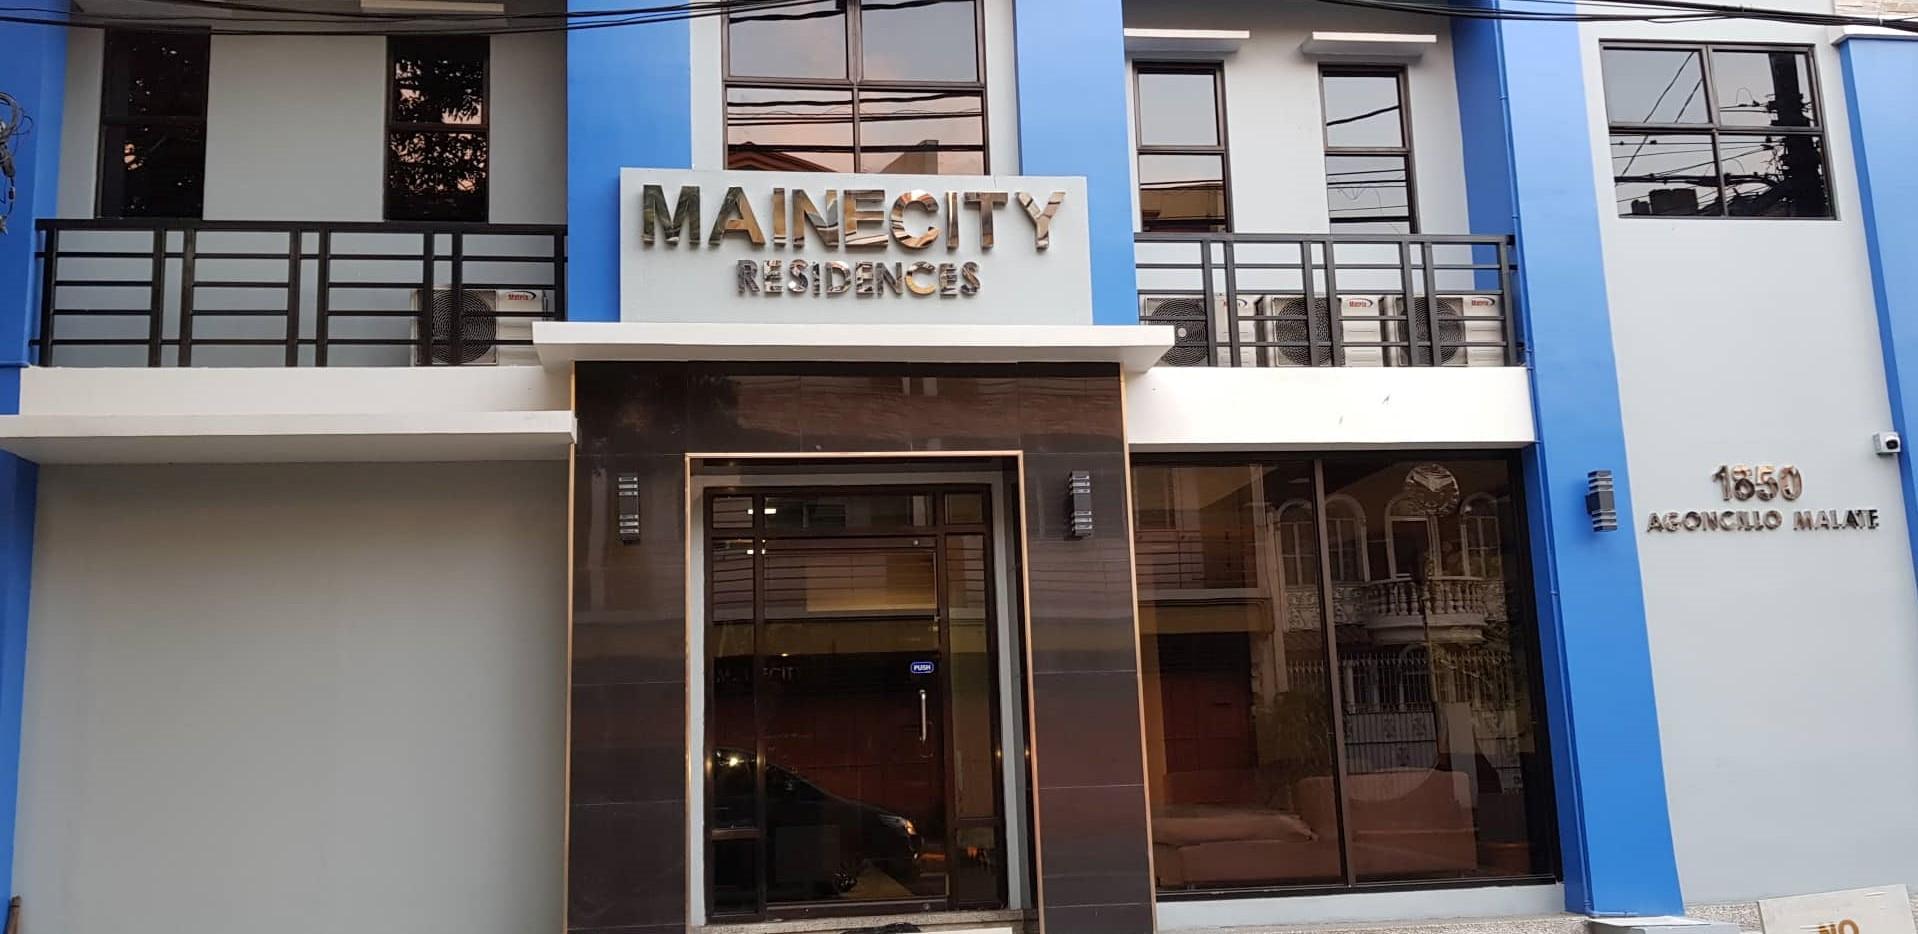 Maine City Residences